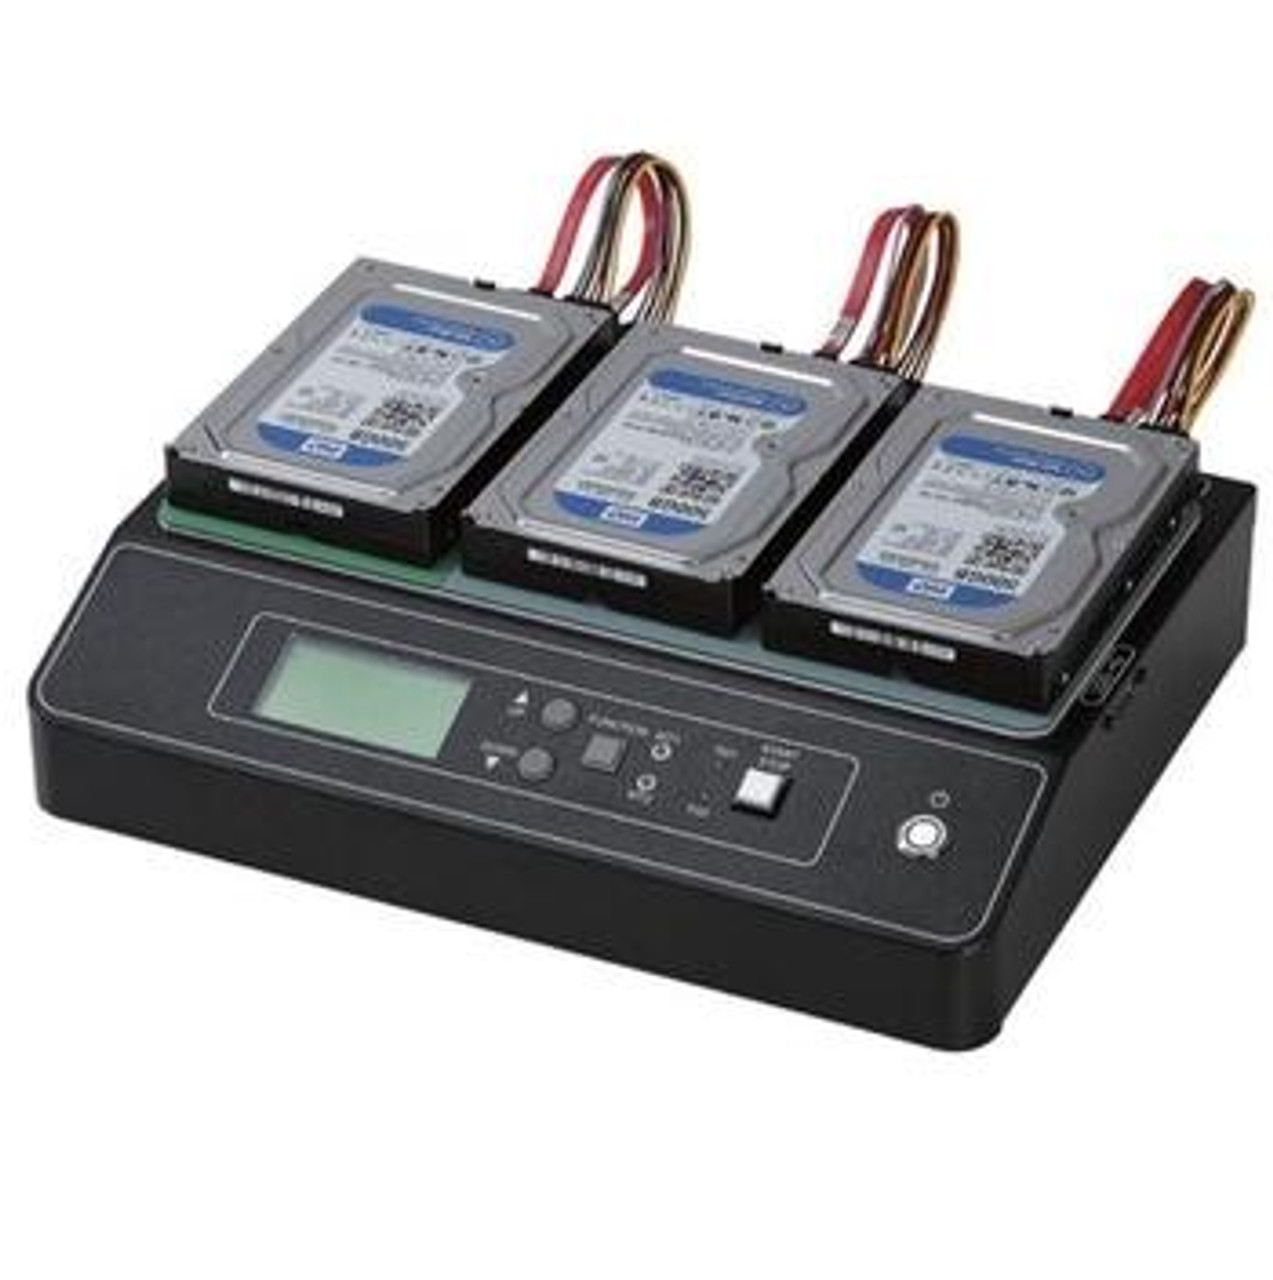 FX2255 4-port SATA/SAS Duplicator, Eraser, Tester, Forensic